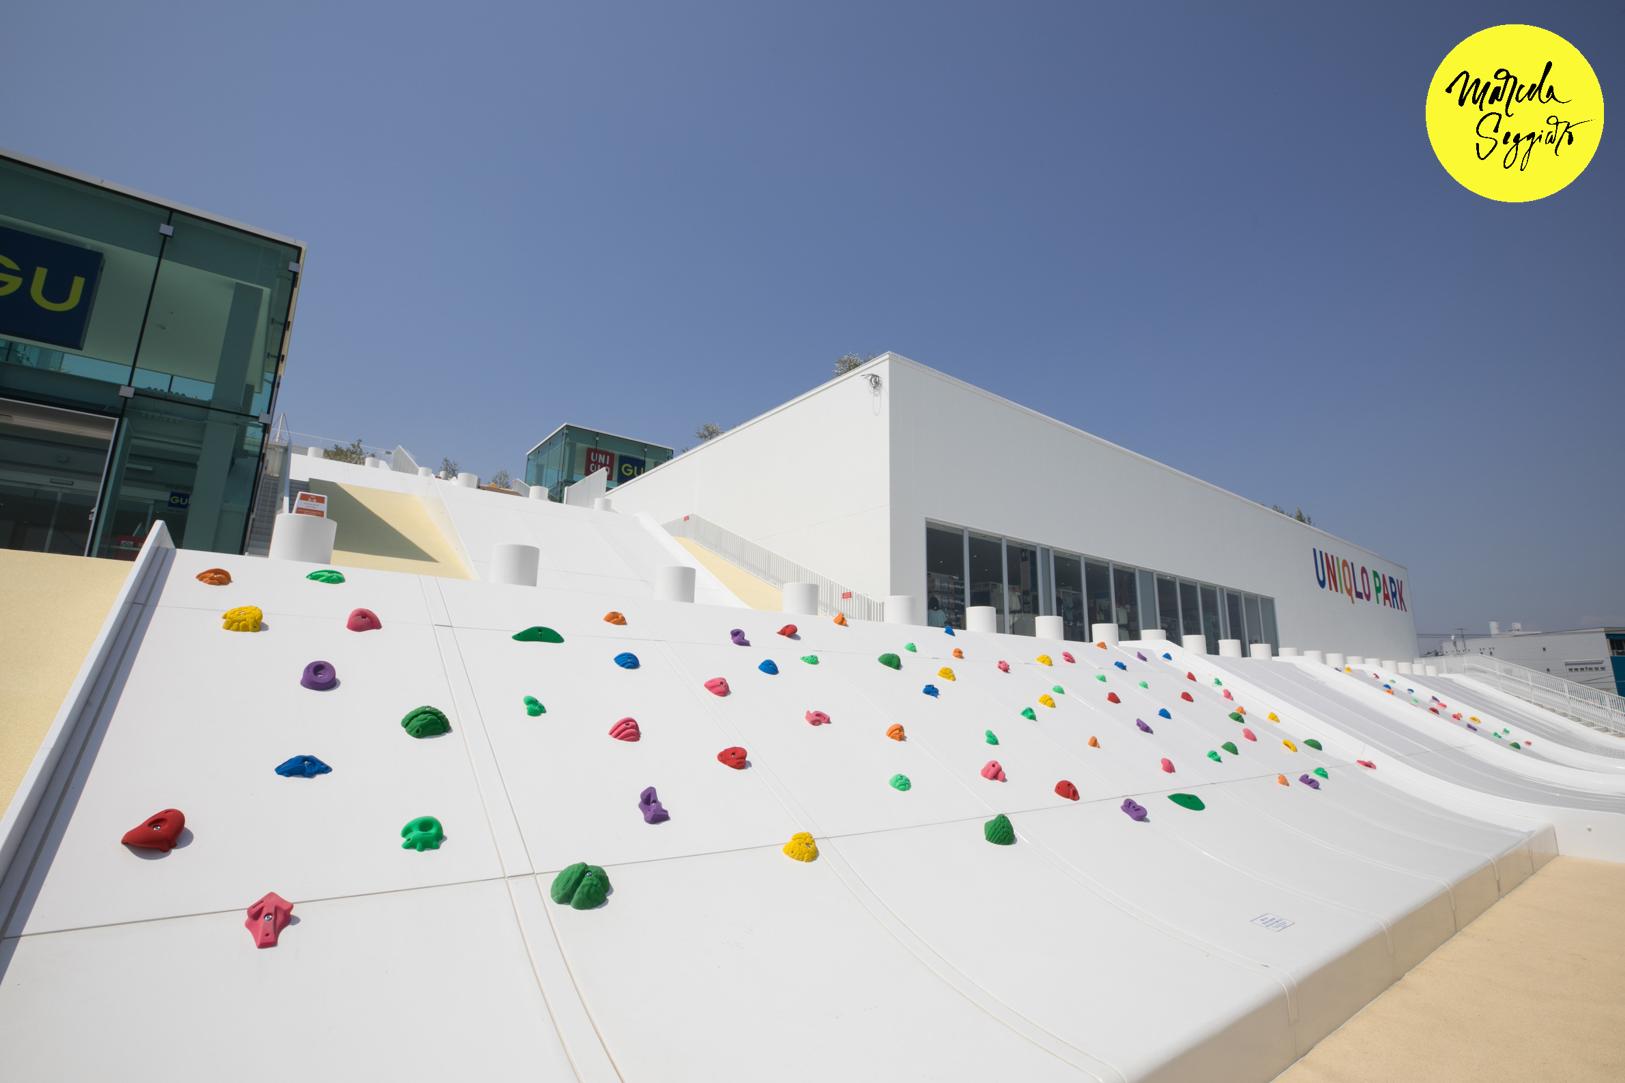 Nuevo Concepto de Tiendas: Parque Uniqlo. Marcela Seggiaro